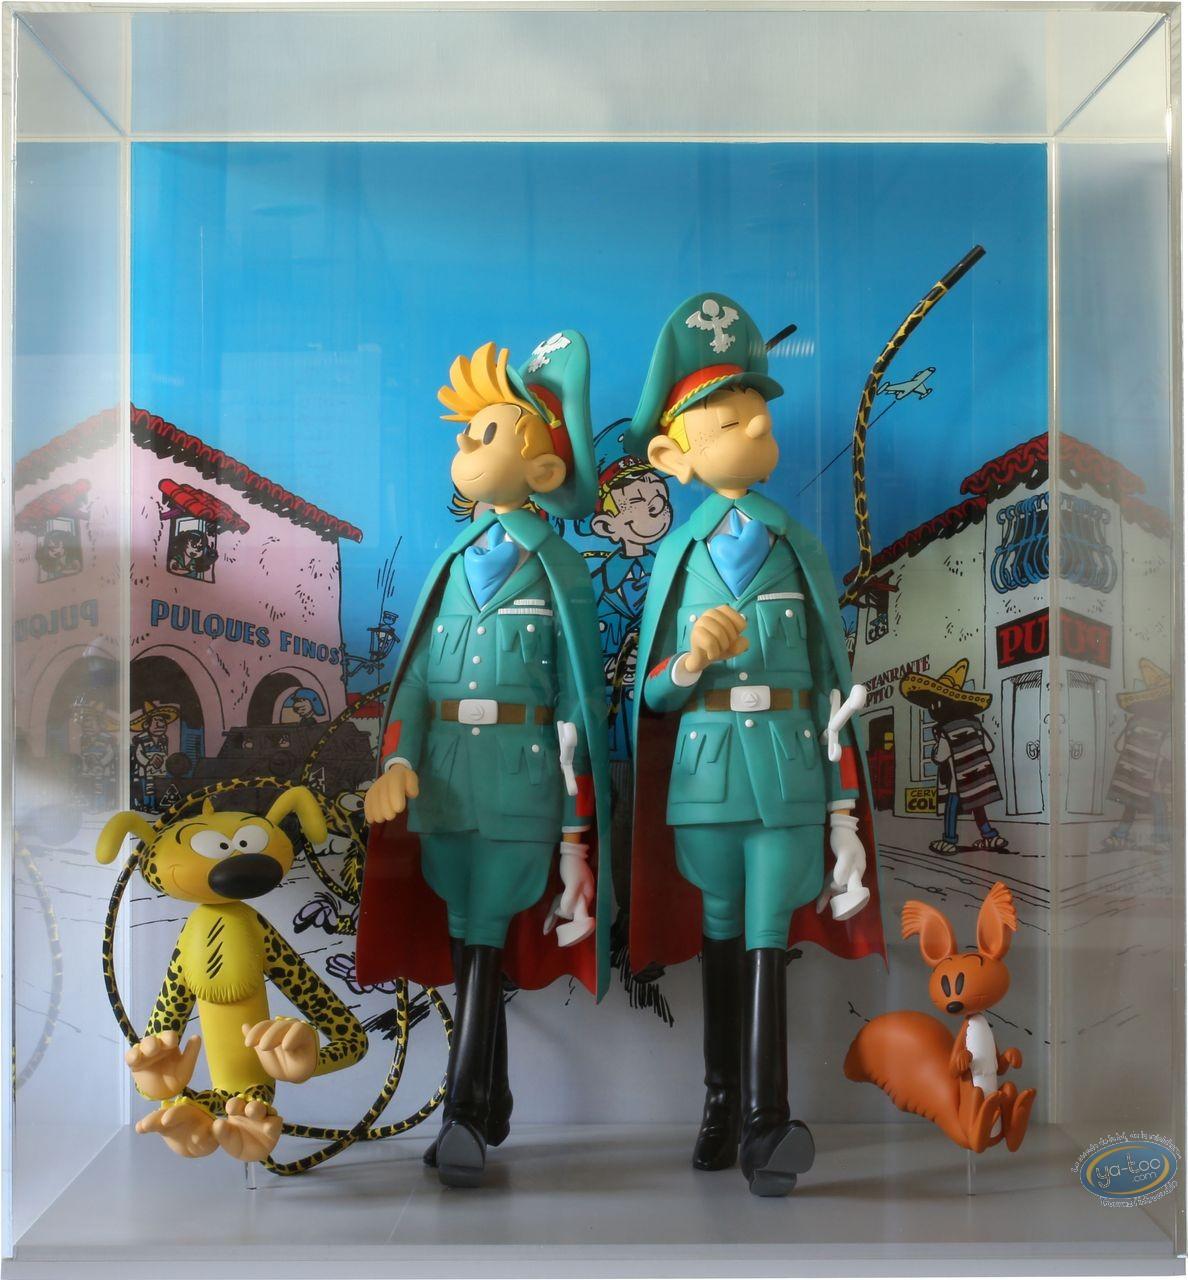 Resin Statuette, Spirou and Fantasio : The Dictator & the Mushroom